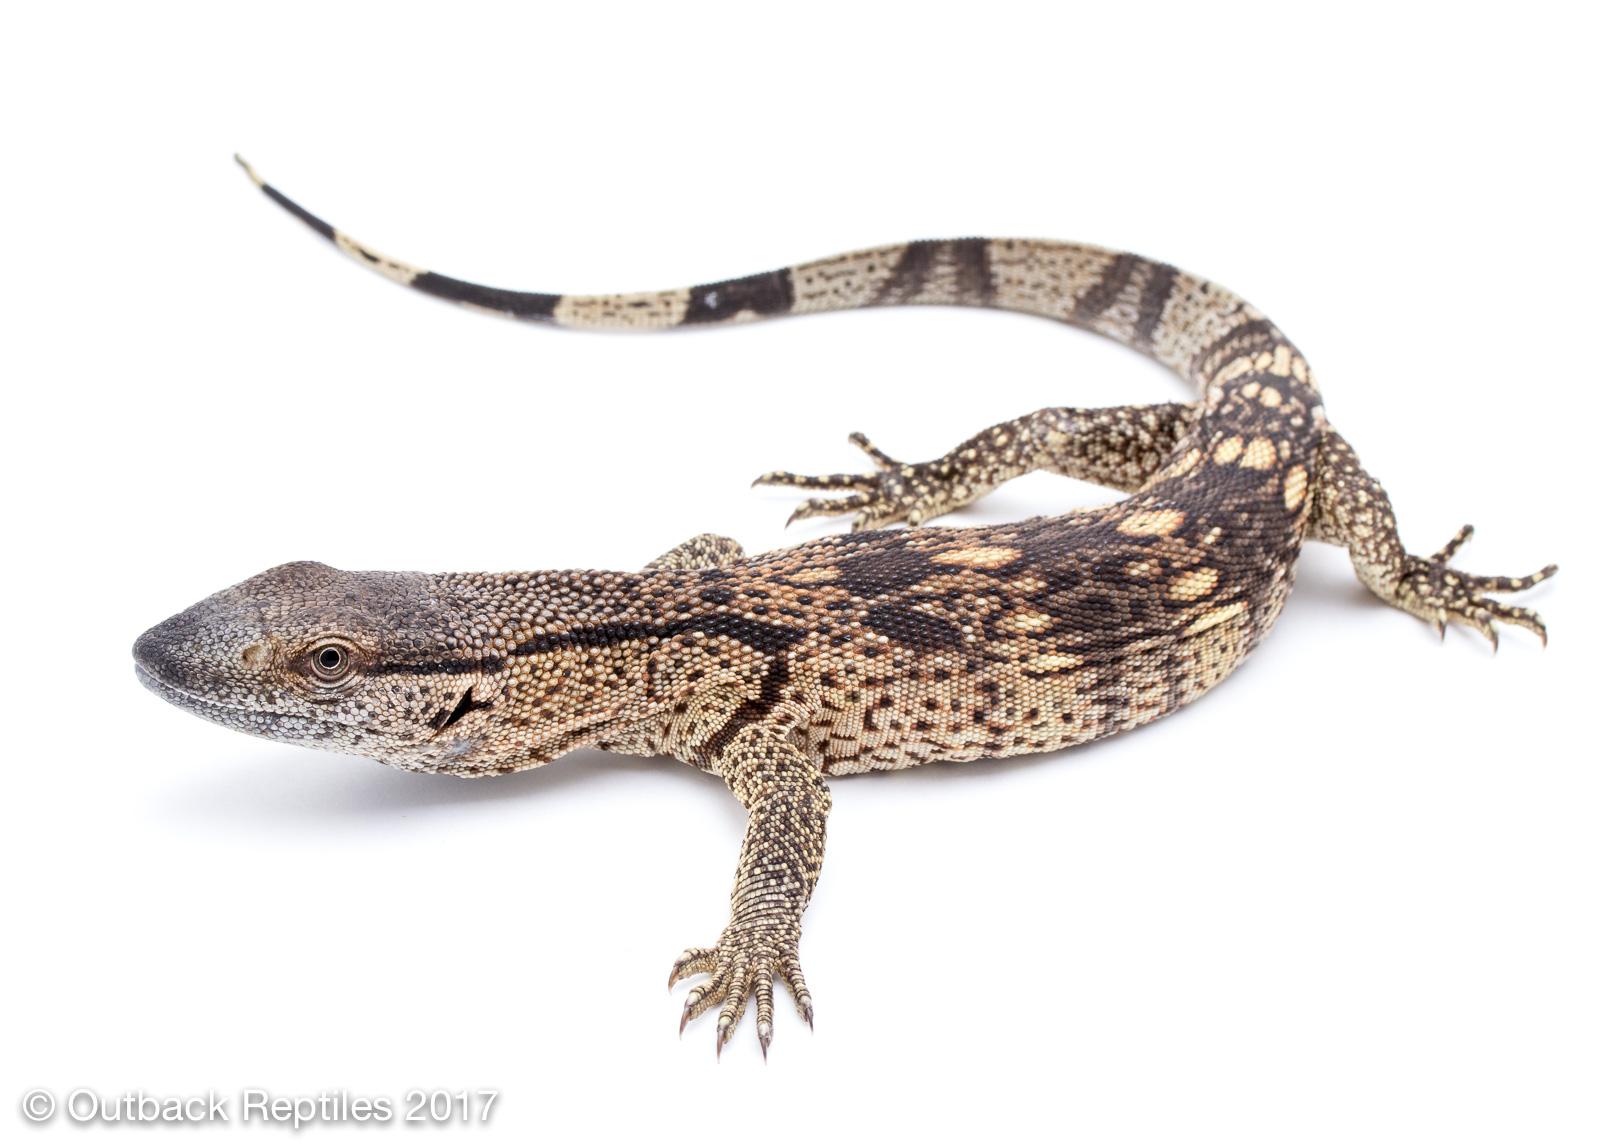 Lizards Outback Reptiles